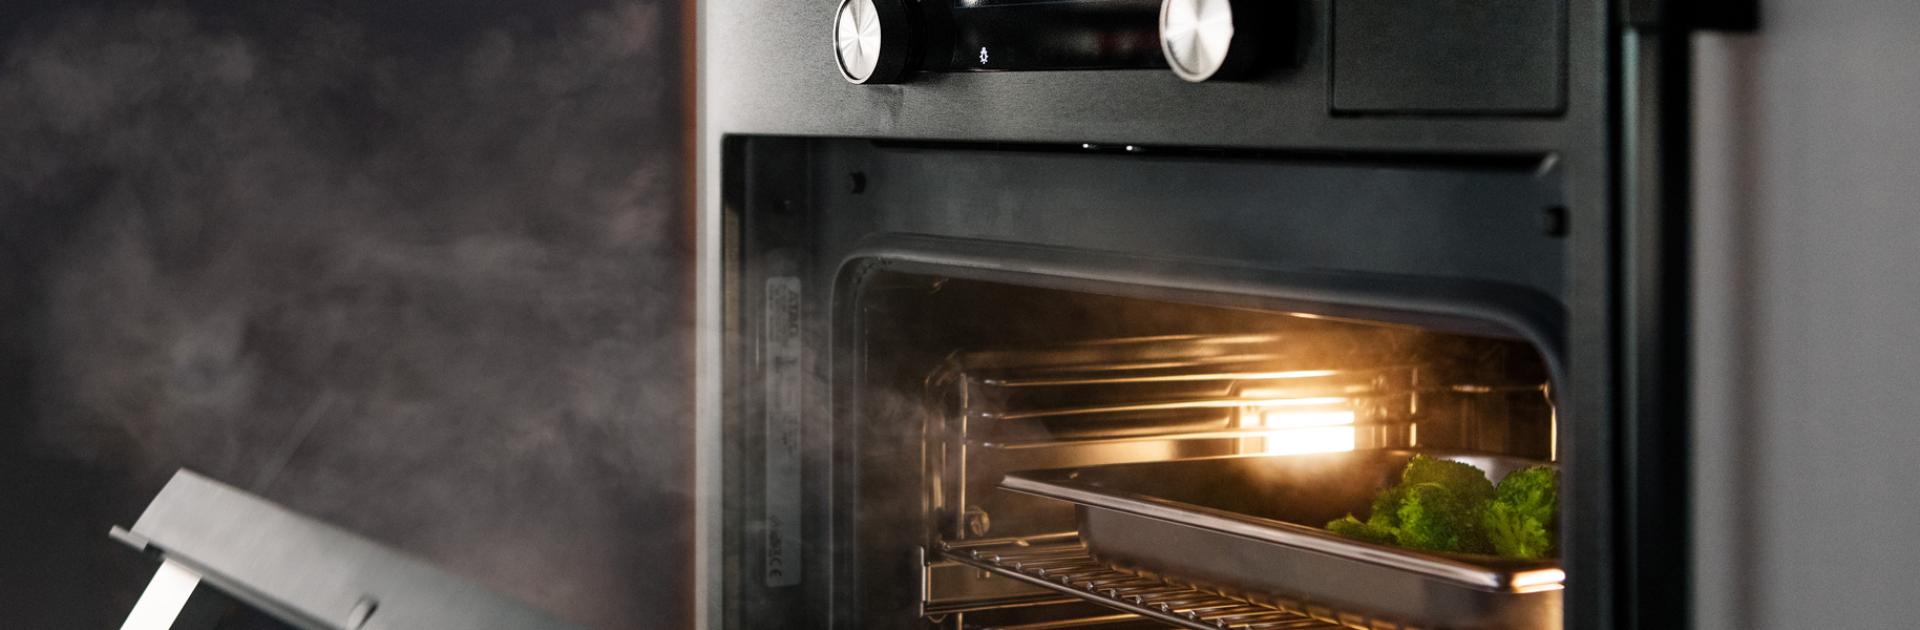 Garantie op apparatuur   Satink Keukens & Badkamers